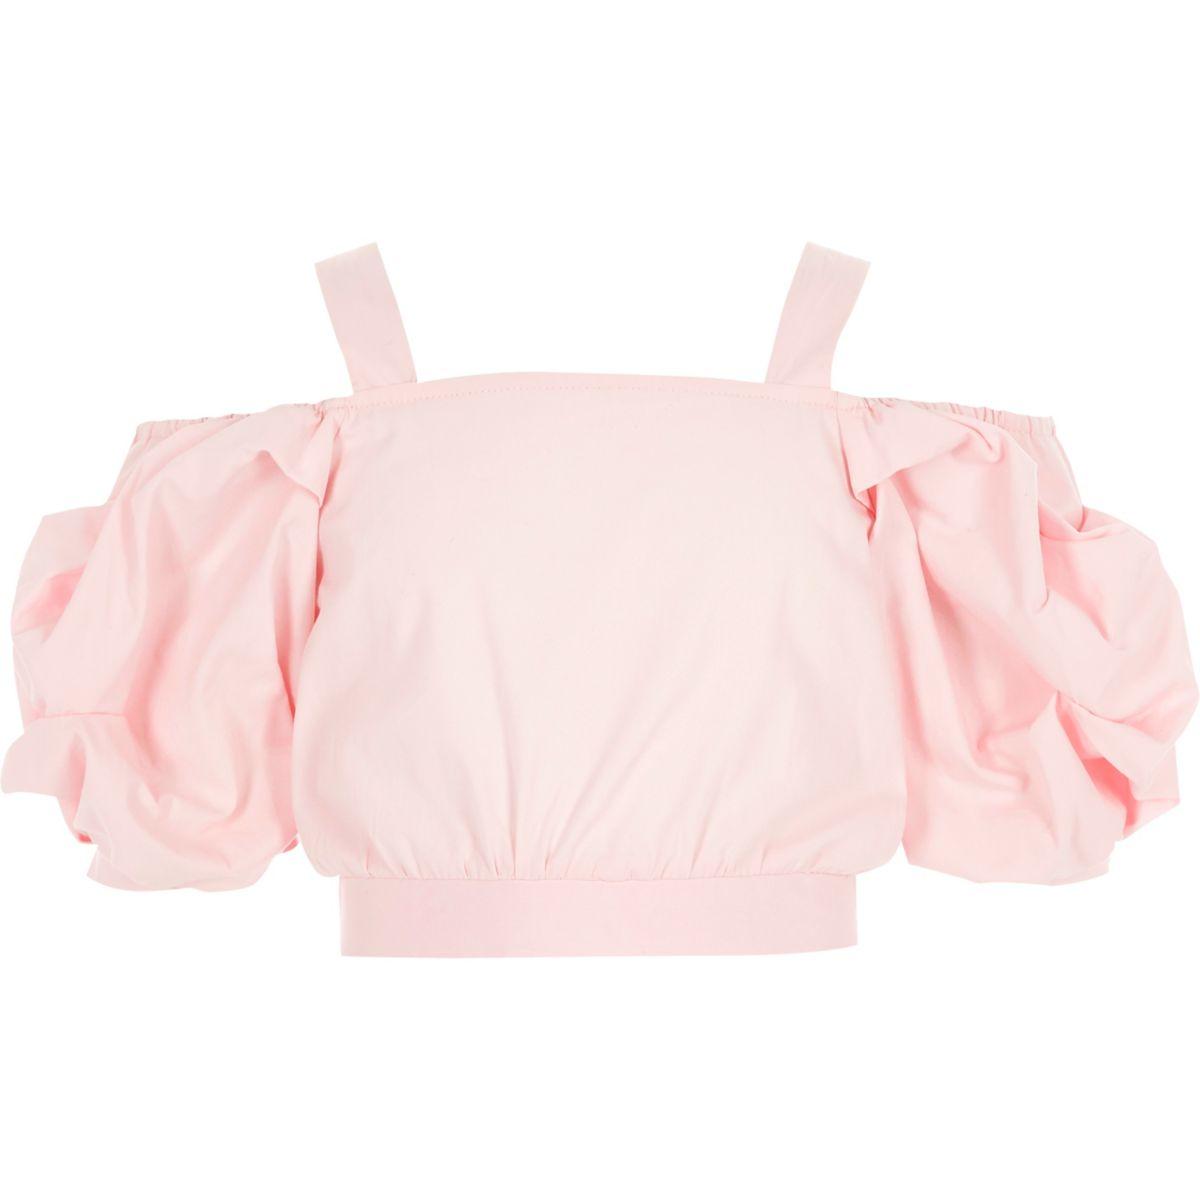 Girls pink cold shoulder crop top